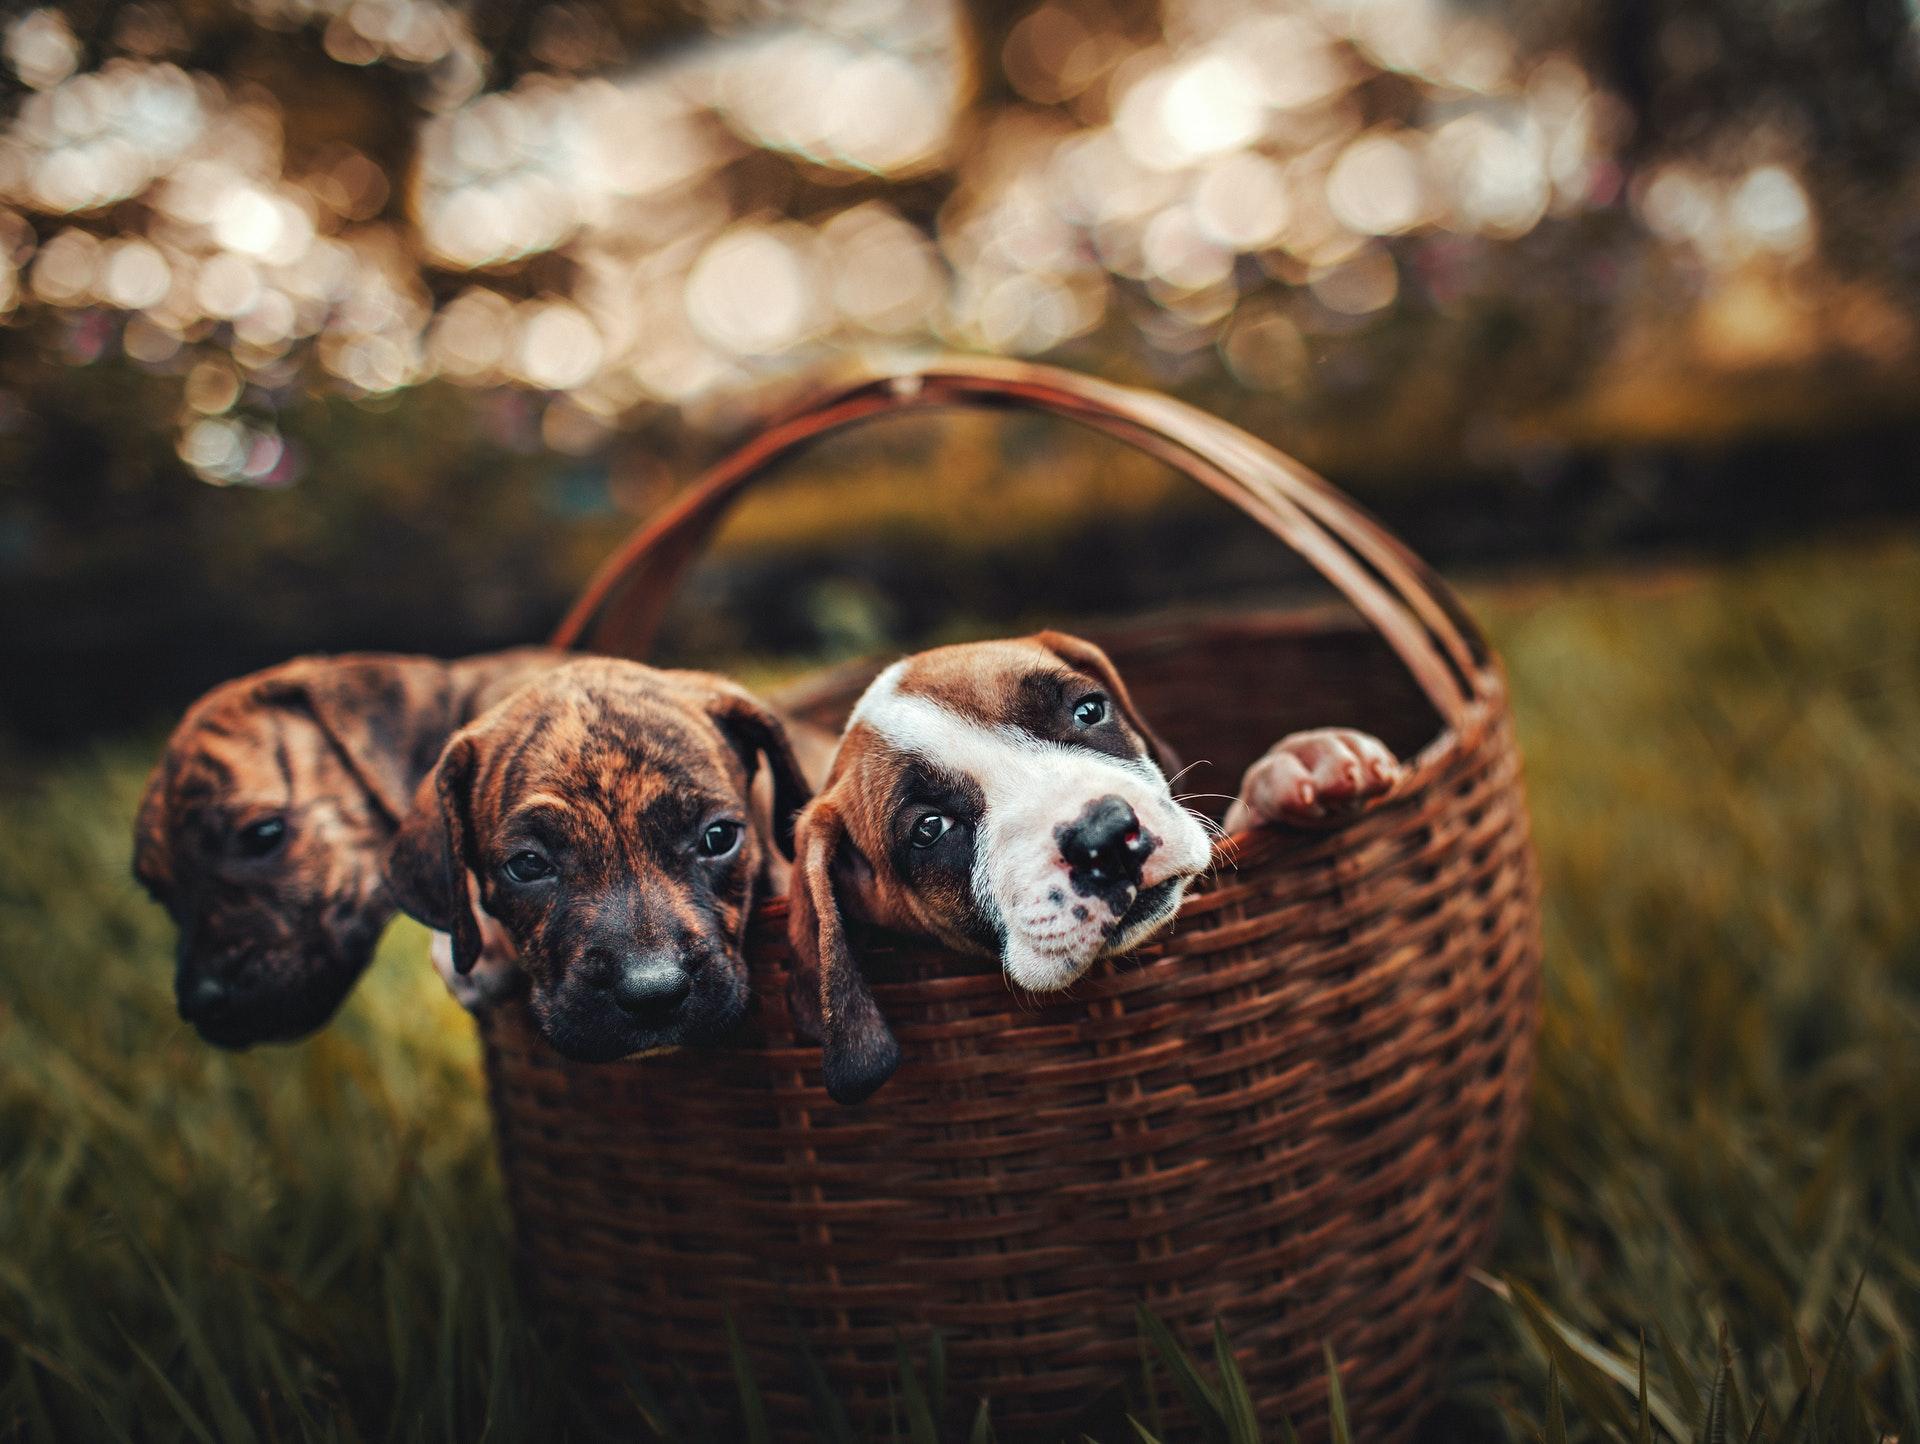 cachorro para comprar de criadores